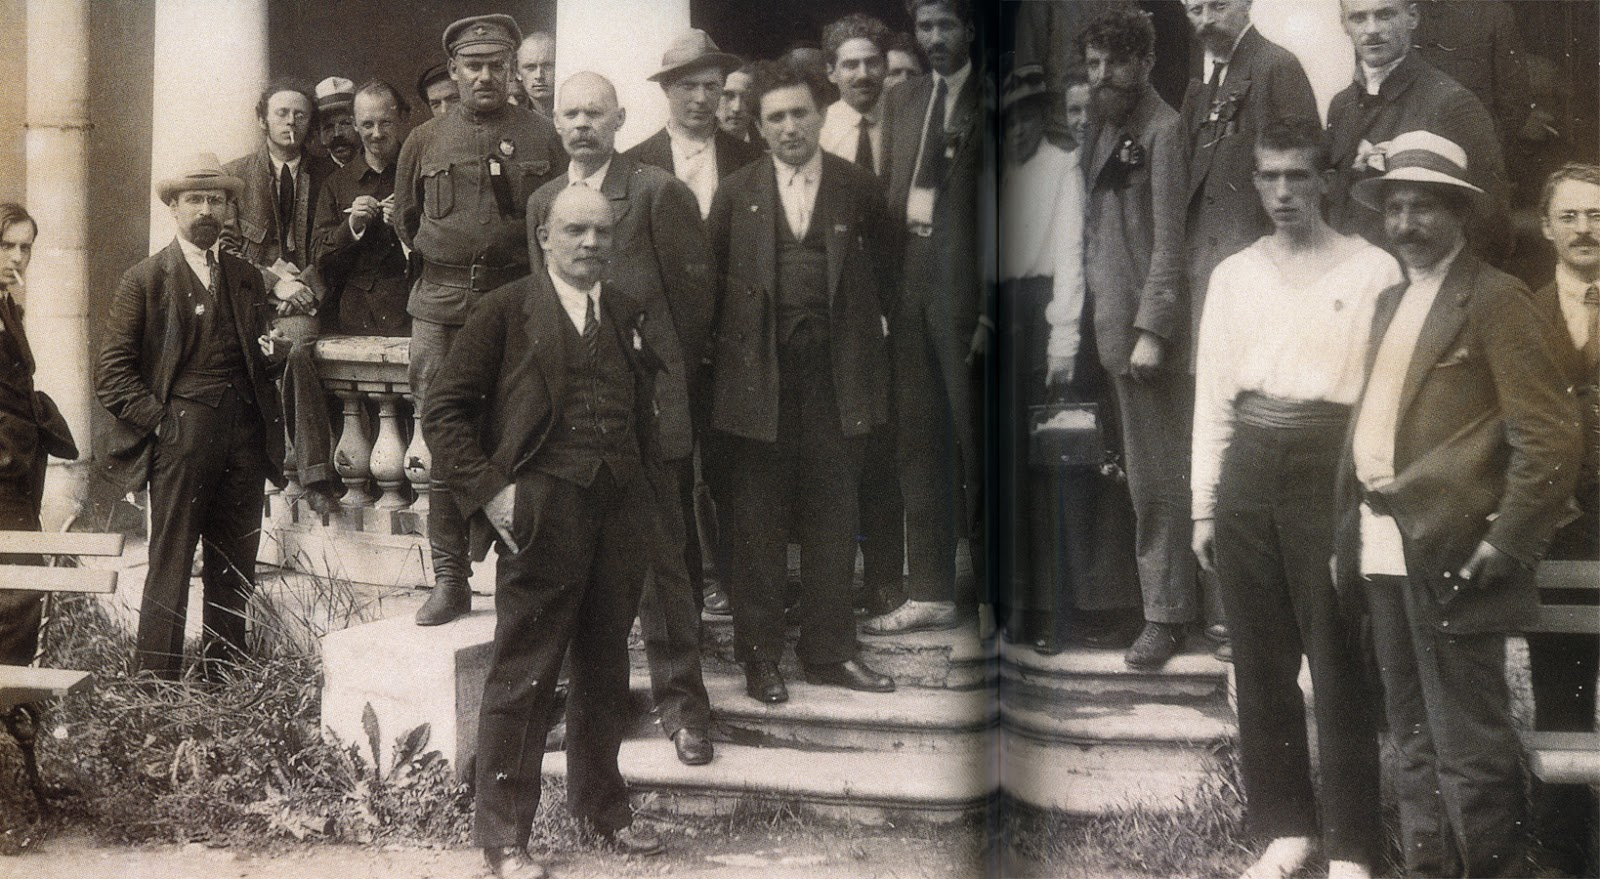 MN Roy Russia Trip After Lenin Invited Him-Innaiah Narisetti Stories-Part6